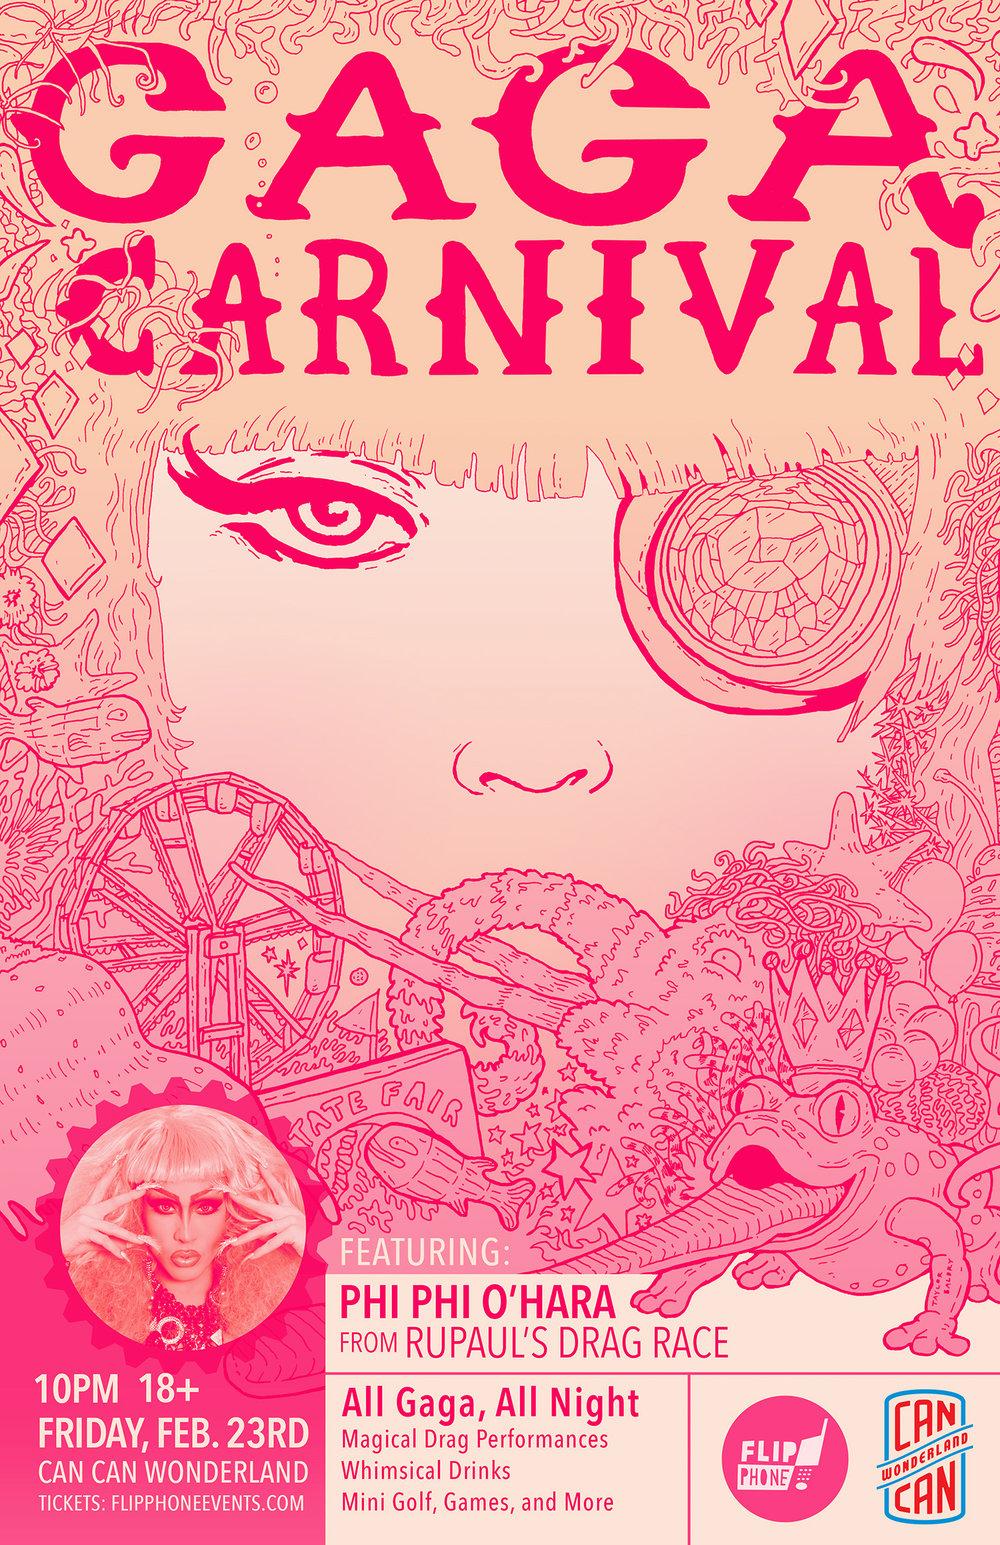 Taylor-Baldry-GagaCarnival-Poster-Web.jpg